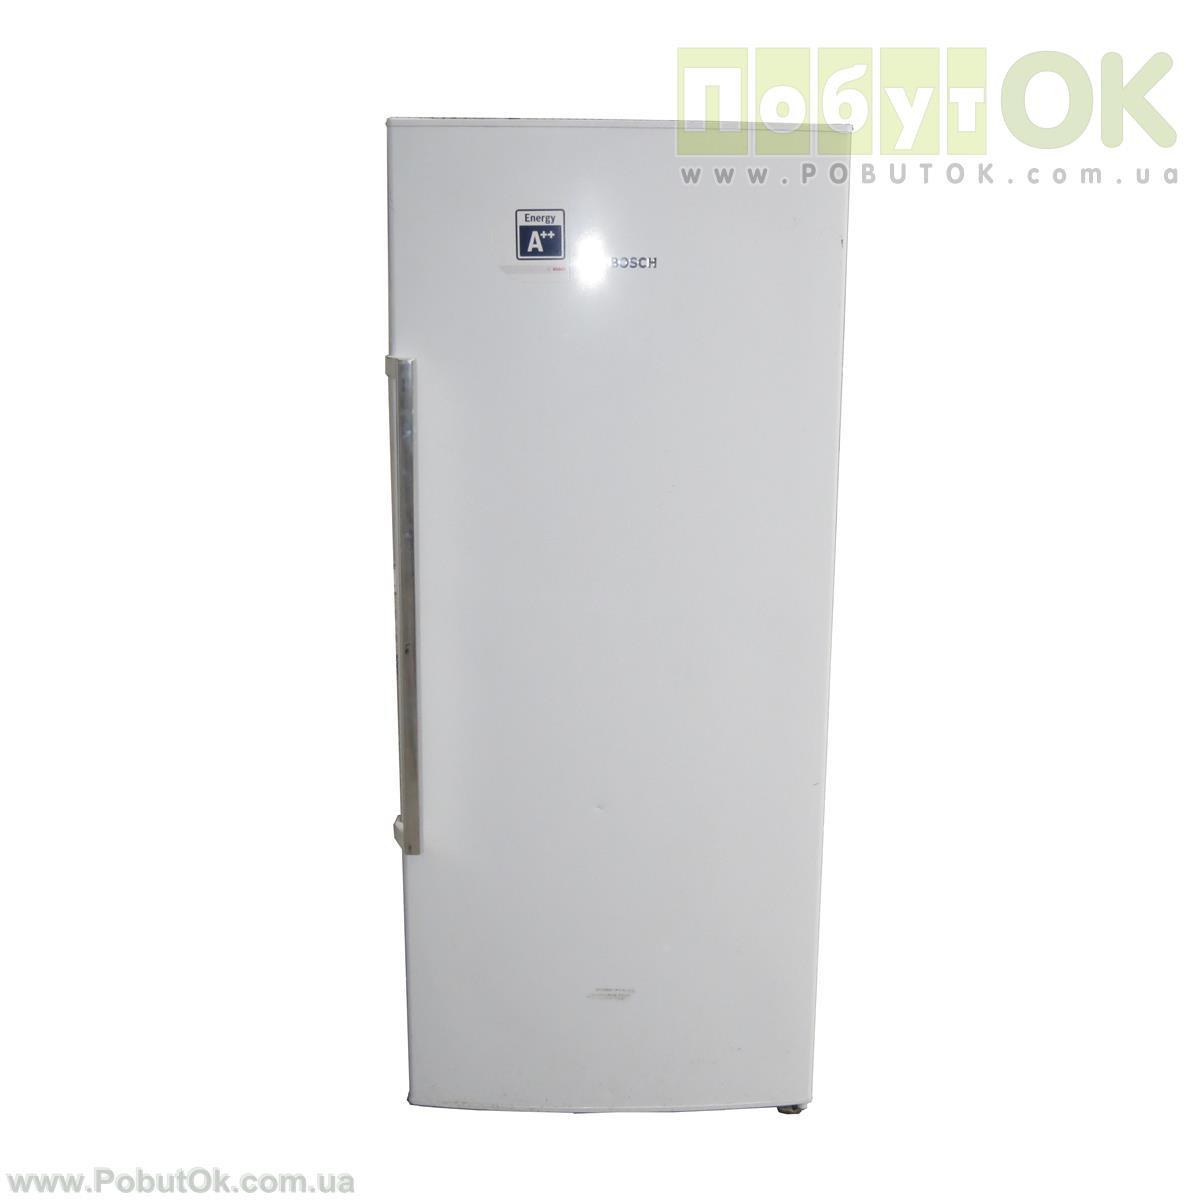 Морозильная Камера BOSCH GSV80E30/01 (Код:0808) Состояние: Б/У